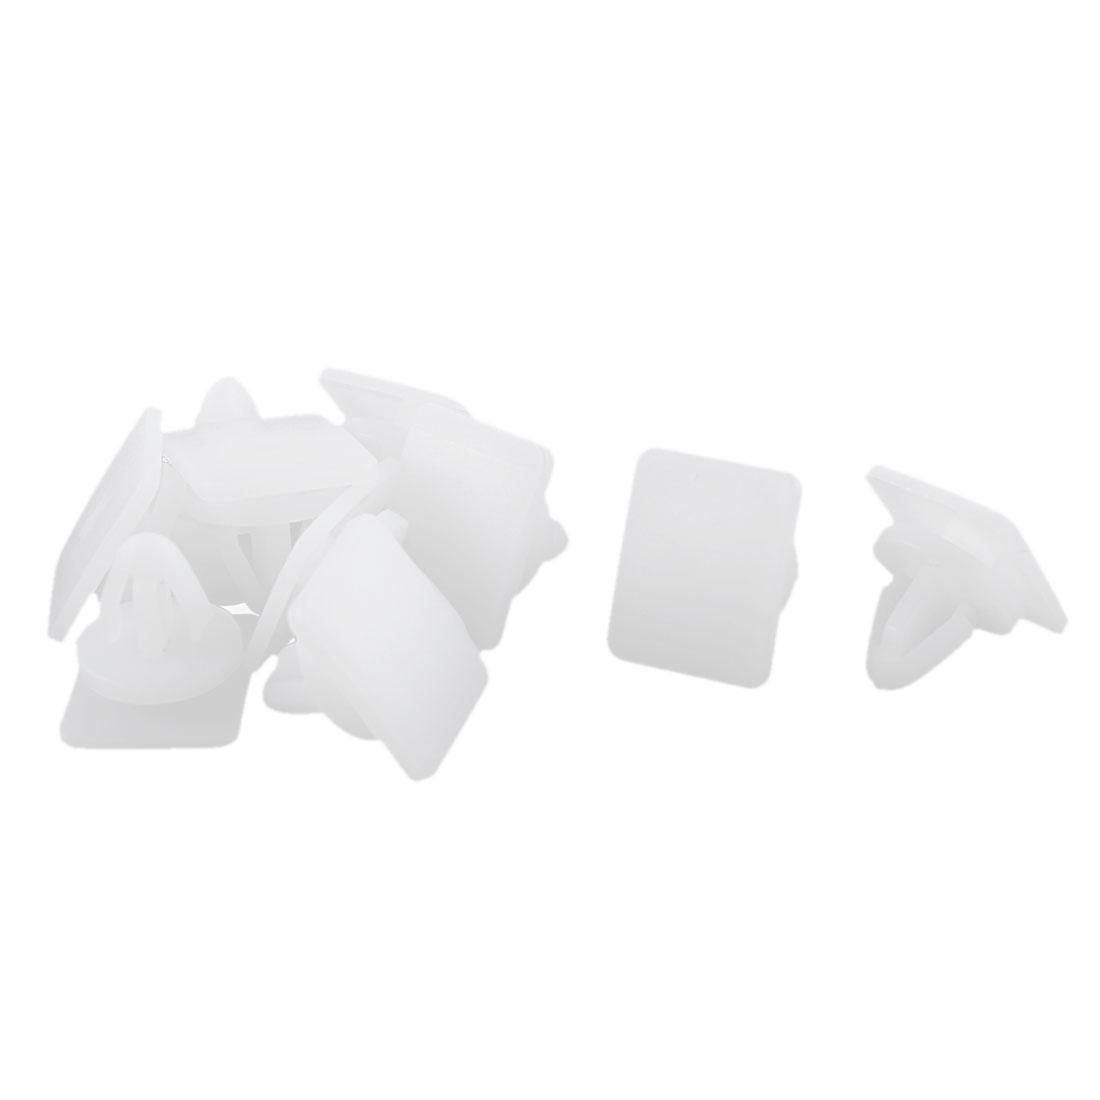 10 Pcs White Plastic Splash Guard Carpet Floor Fastener Rivet for Hyundai